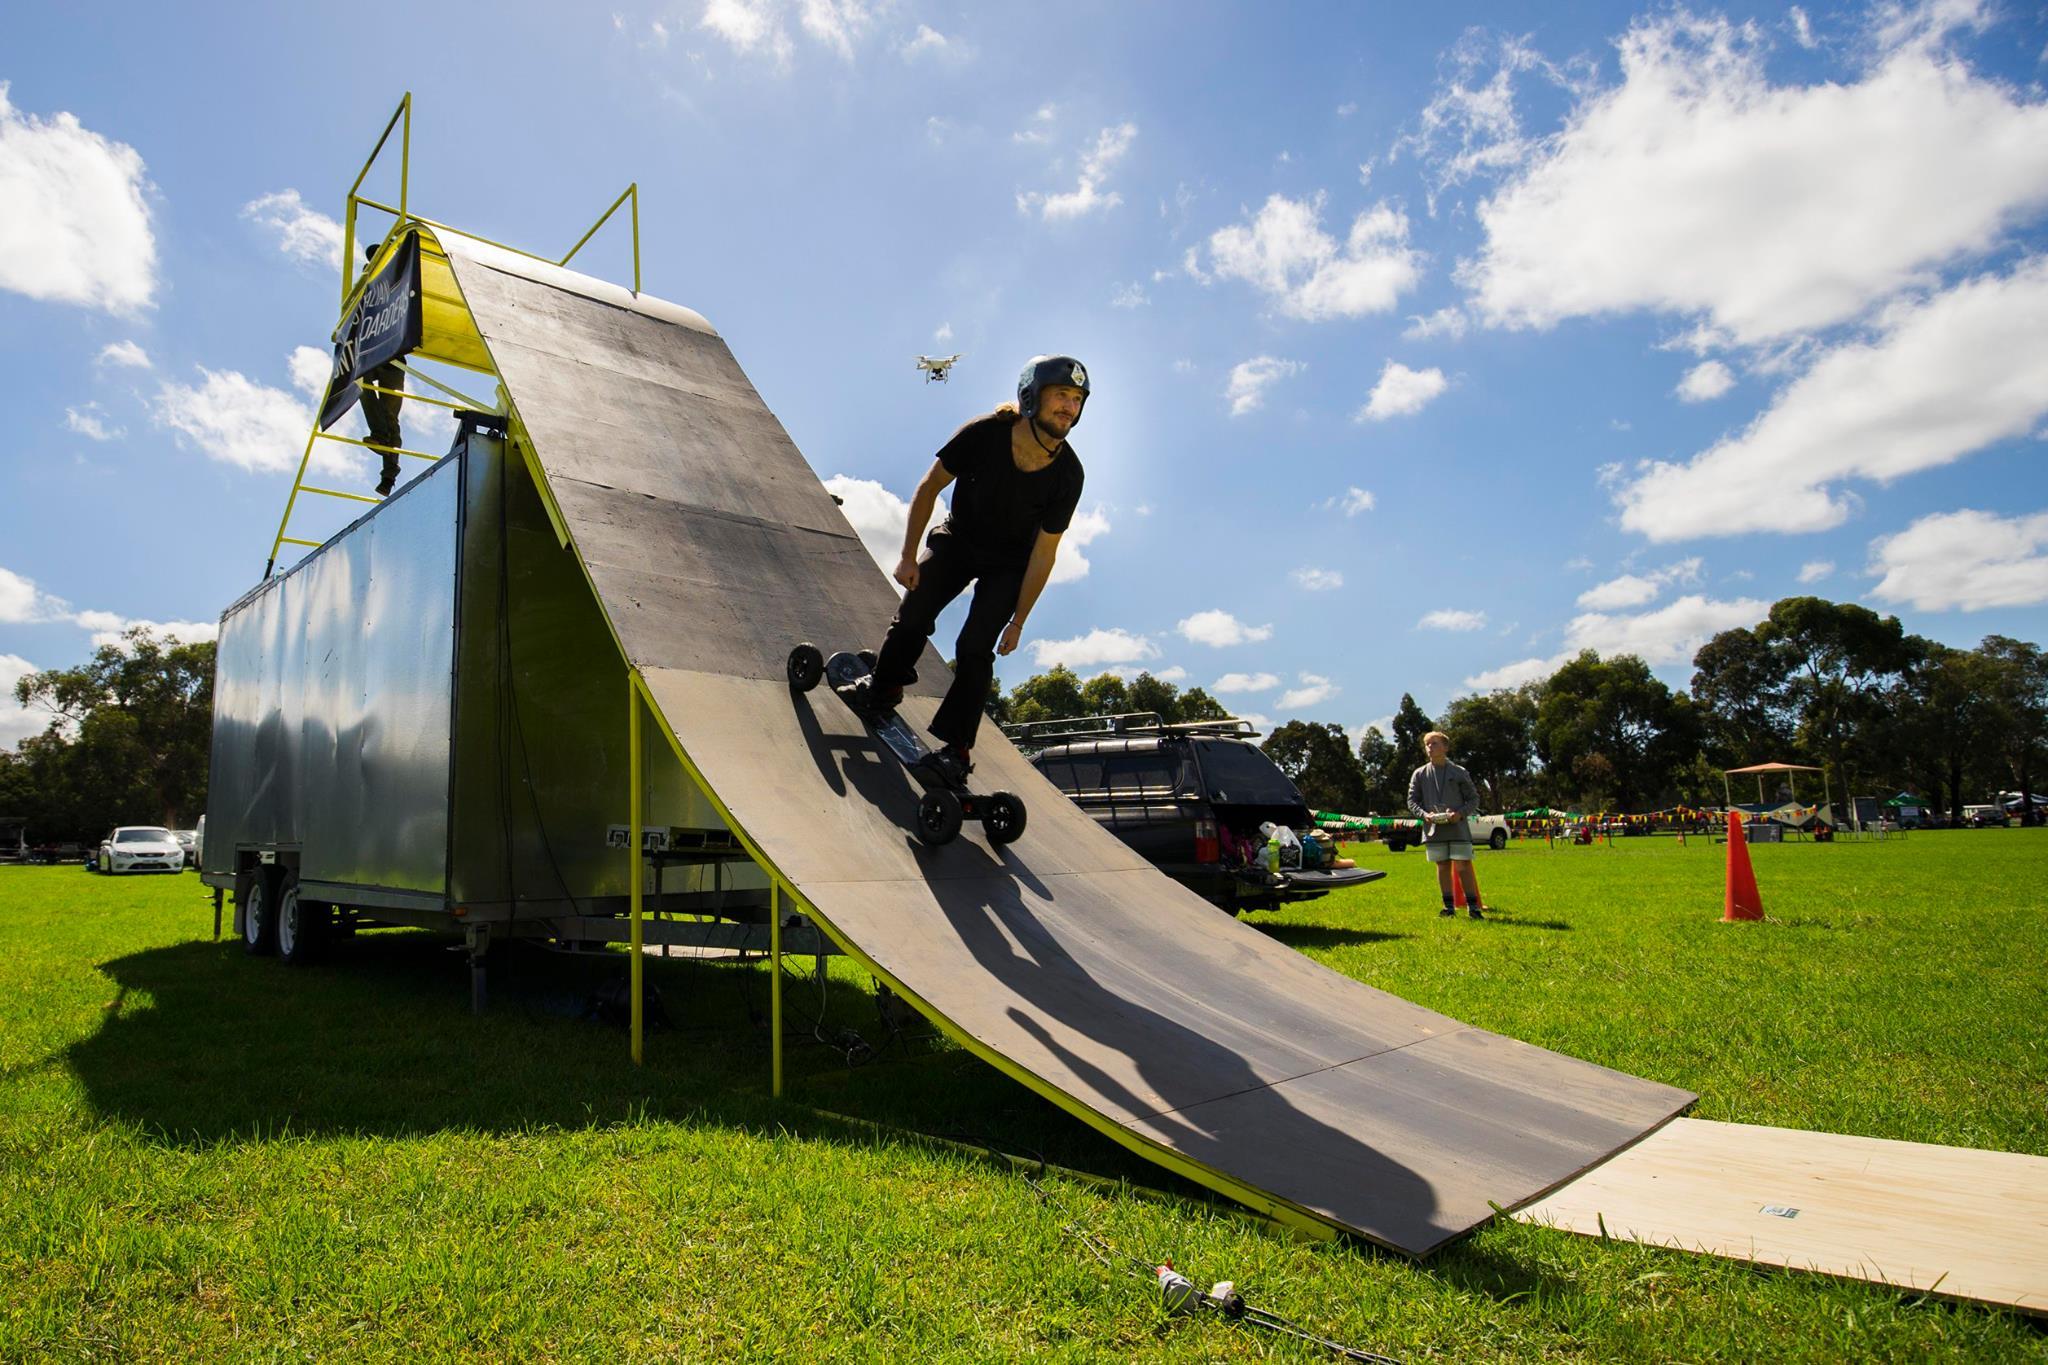 Mountainboard Stunt show, Extreme sports stunt show